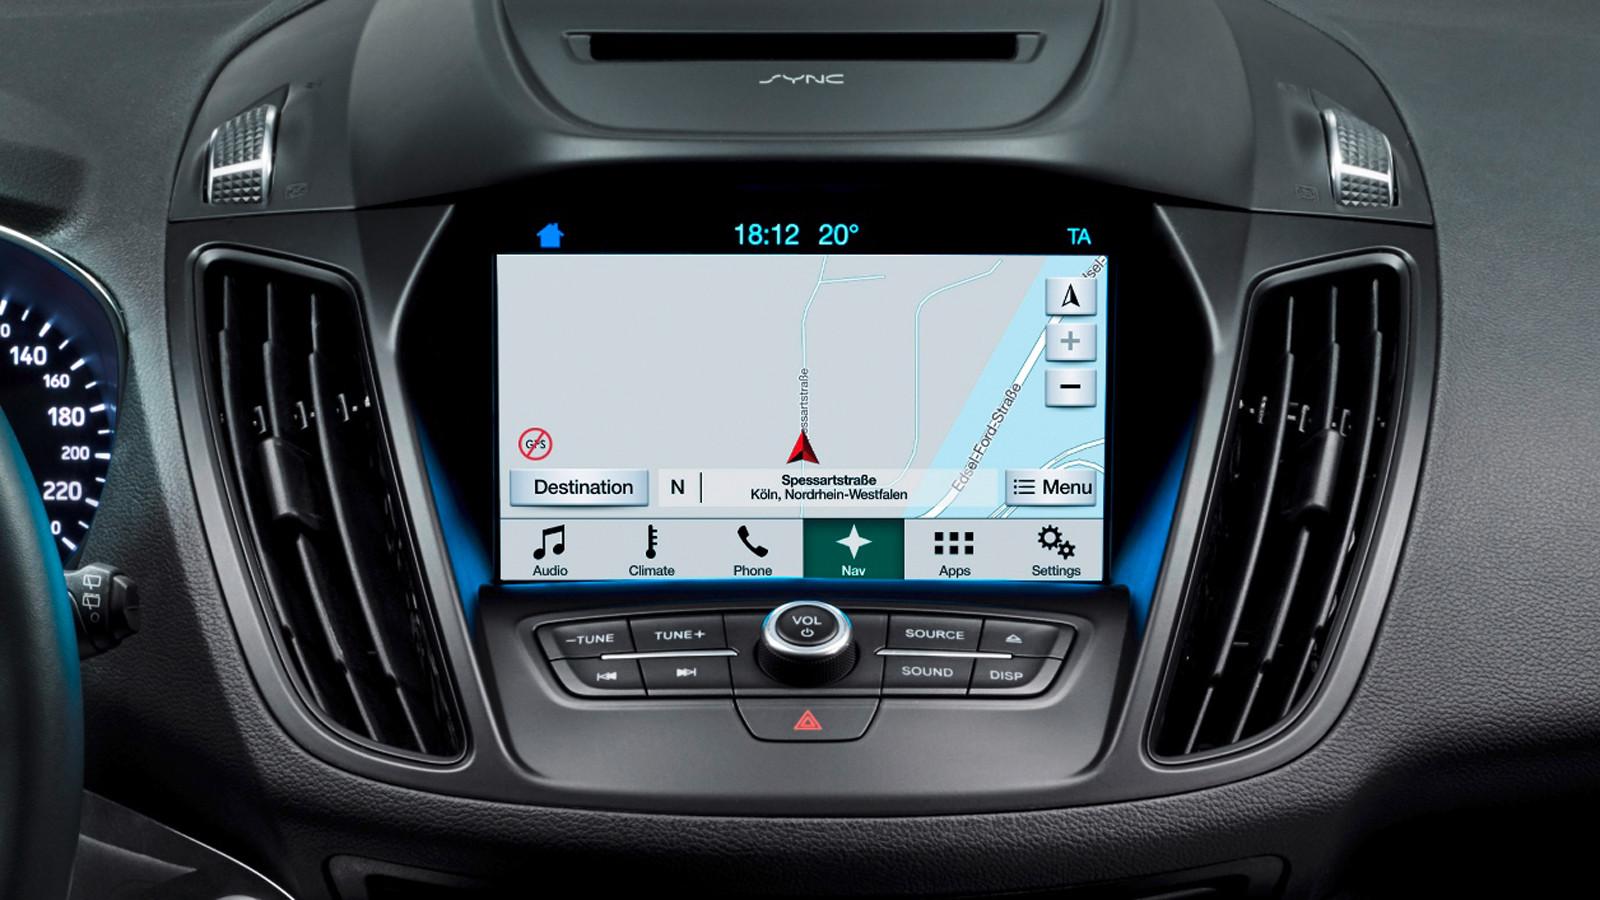 Автомобили Форд получат поддержку Wi-Fi